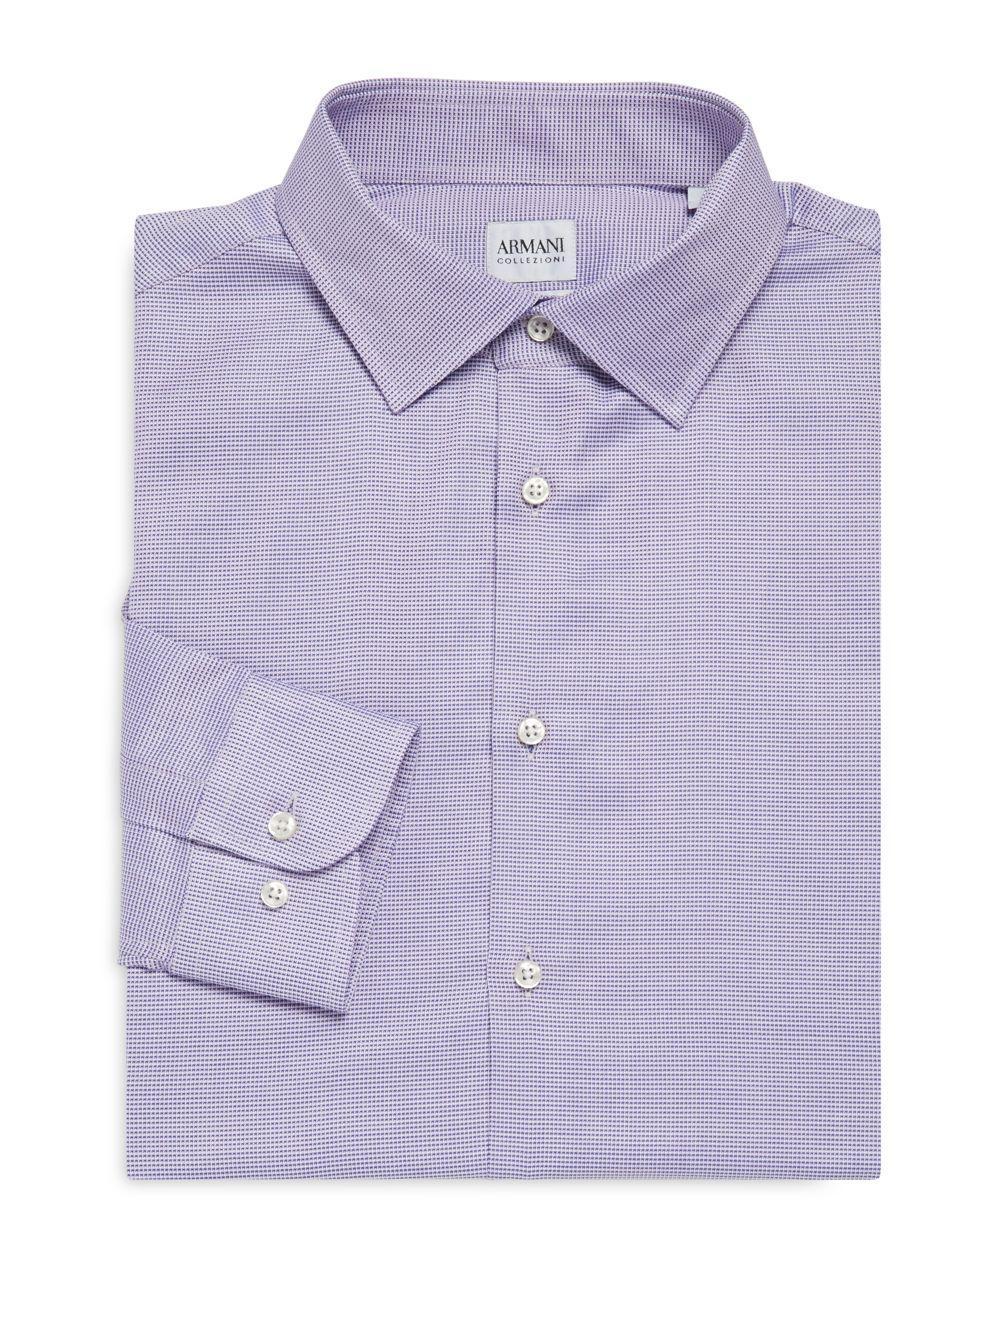 Armani modern fit textured dress shirt in pink for men lyst for Modern fit dress shirt